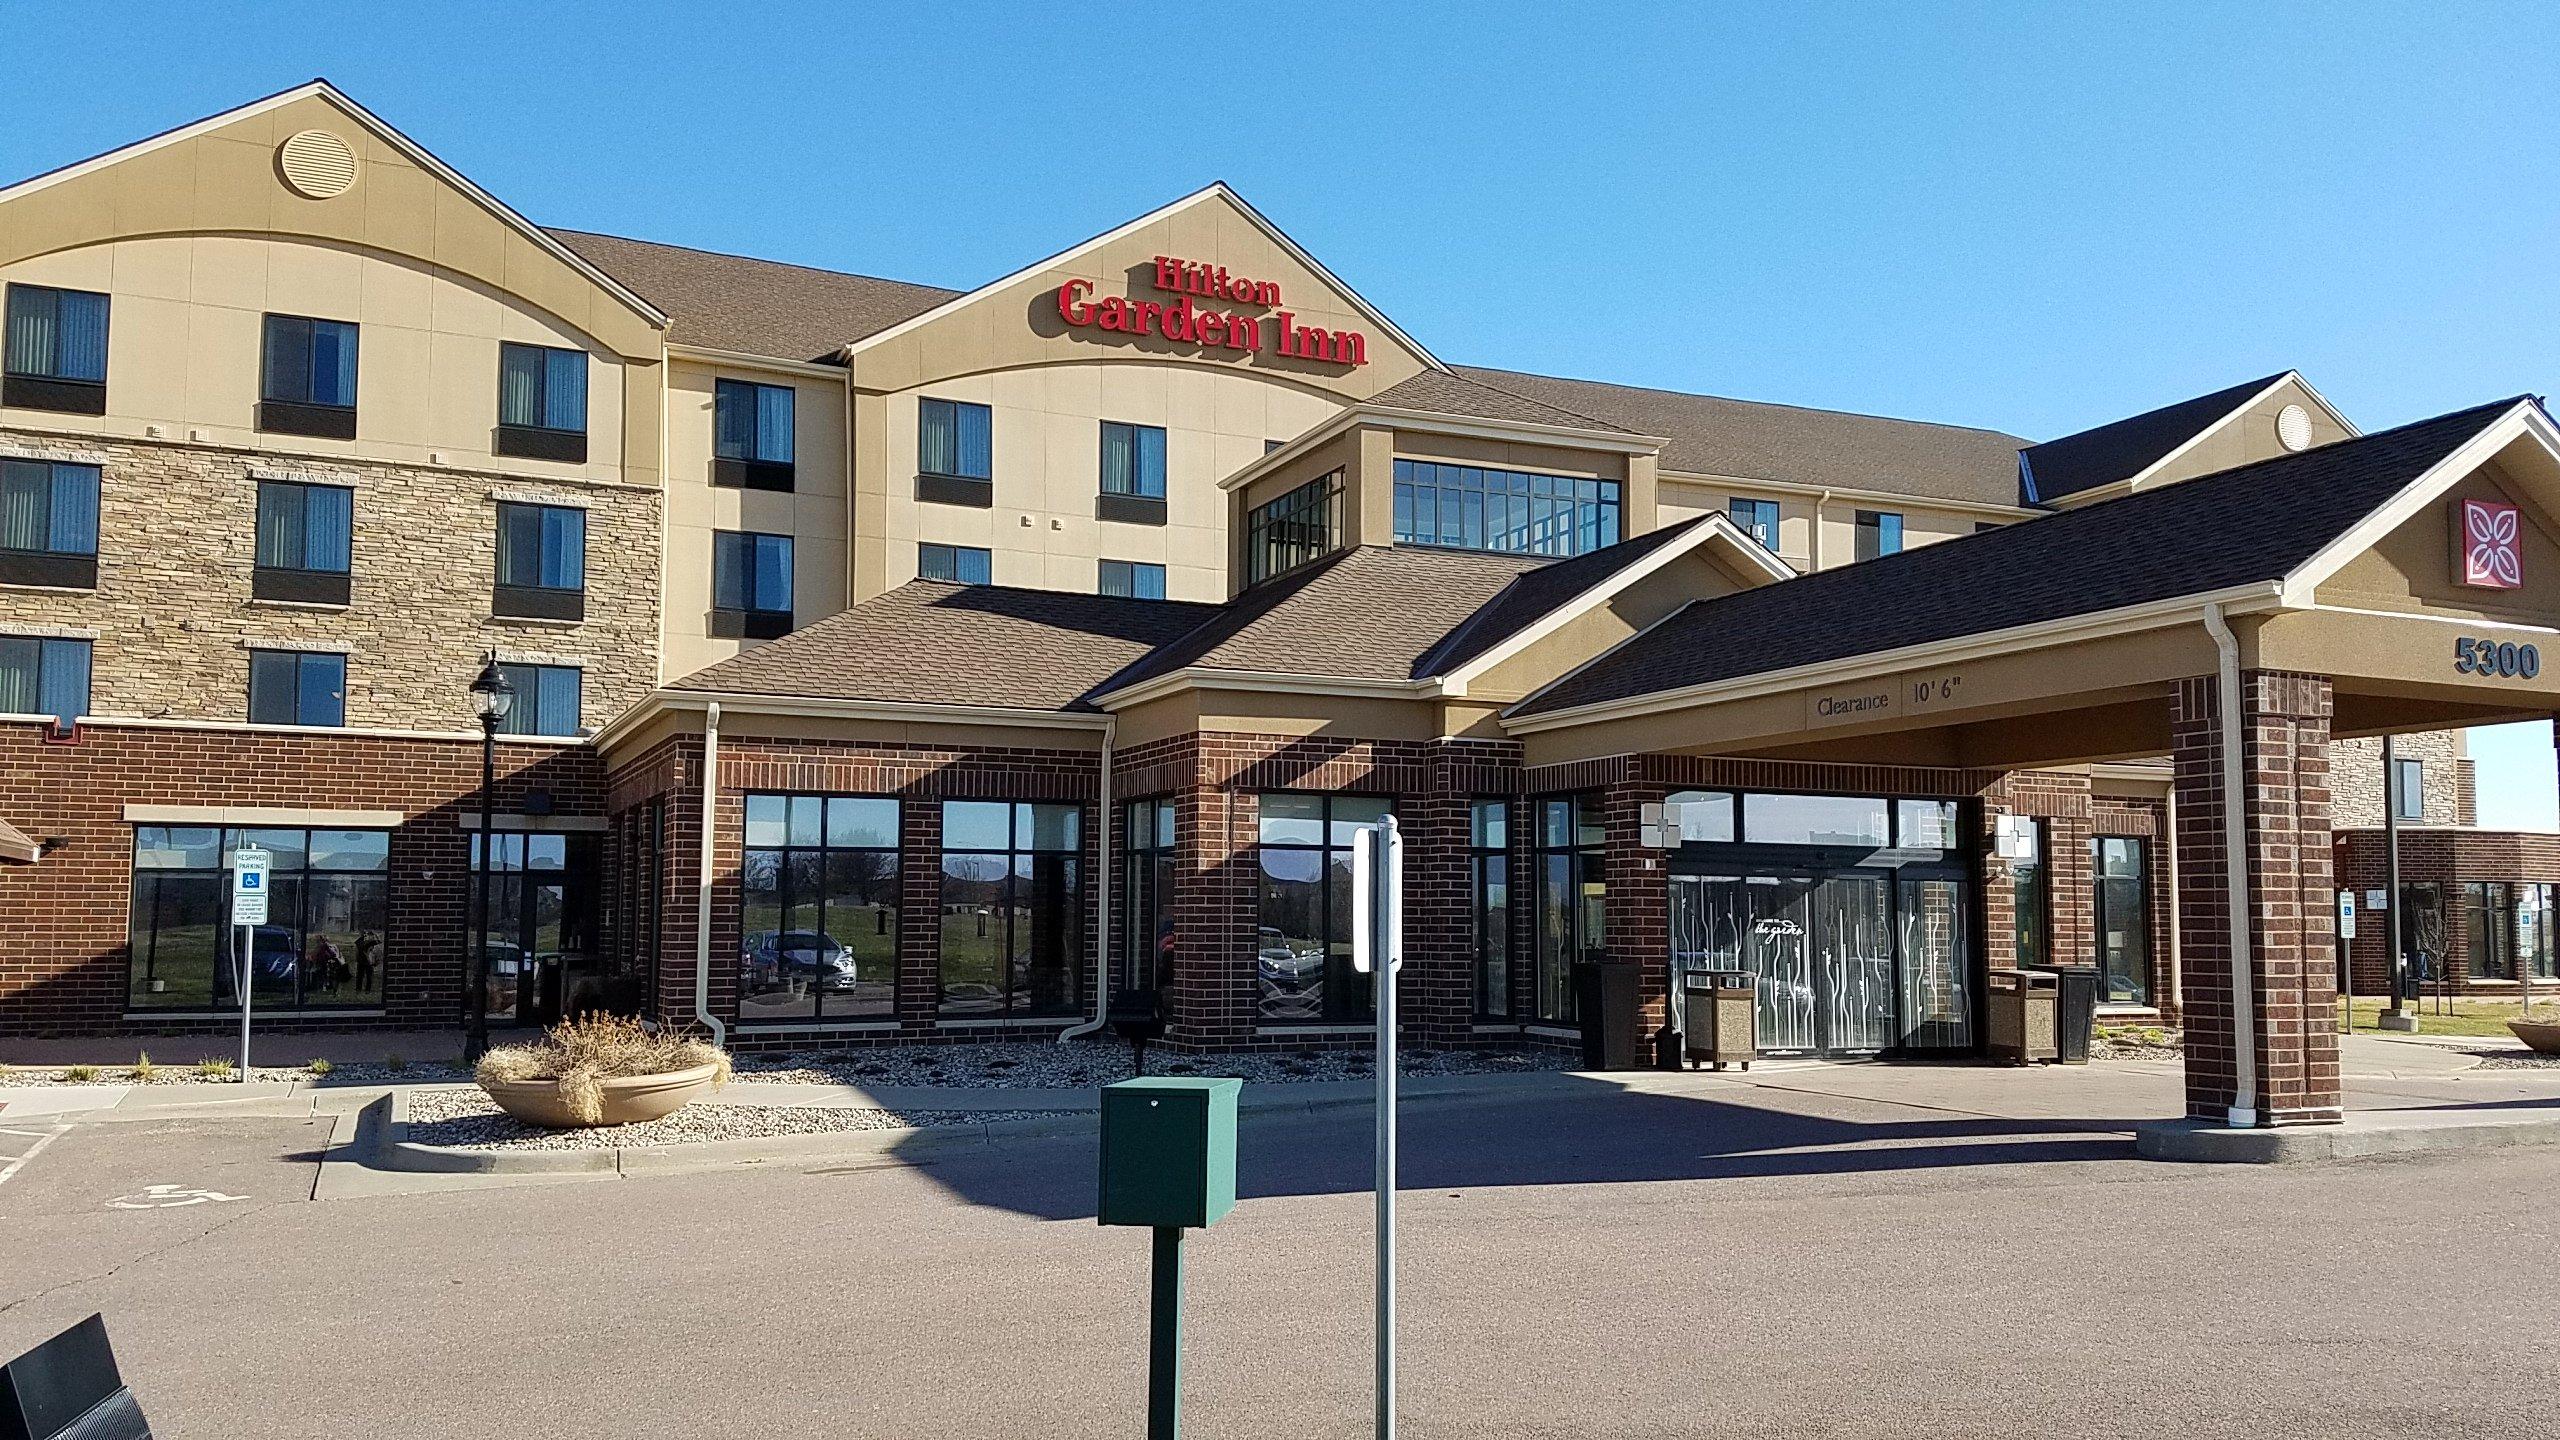 Hilton Garden Inn Sioux Falls South Sd 2018 Hotel Review